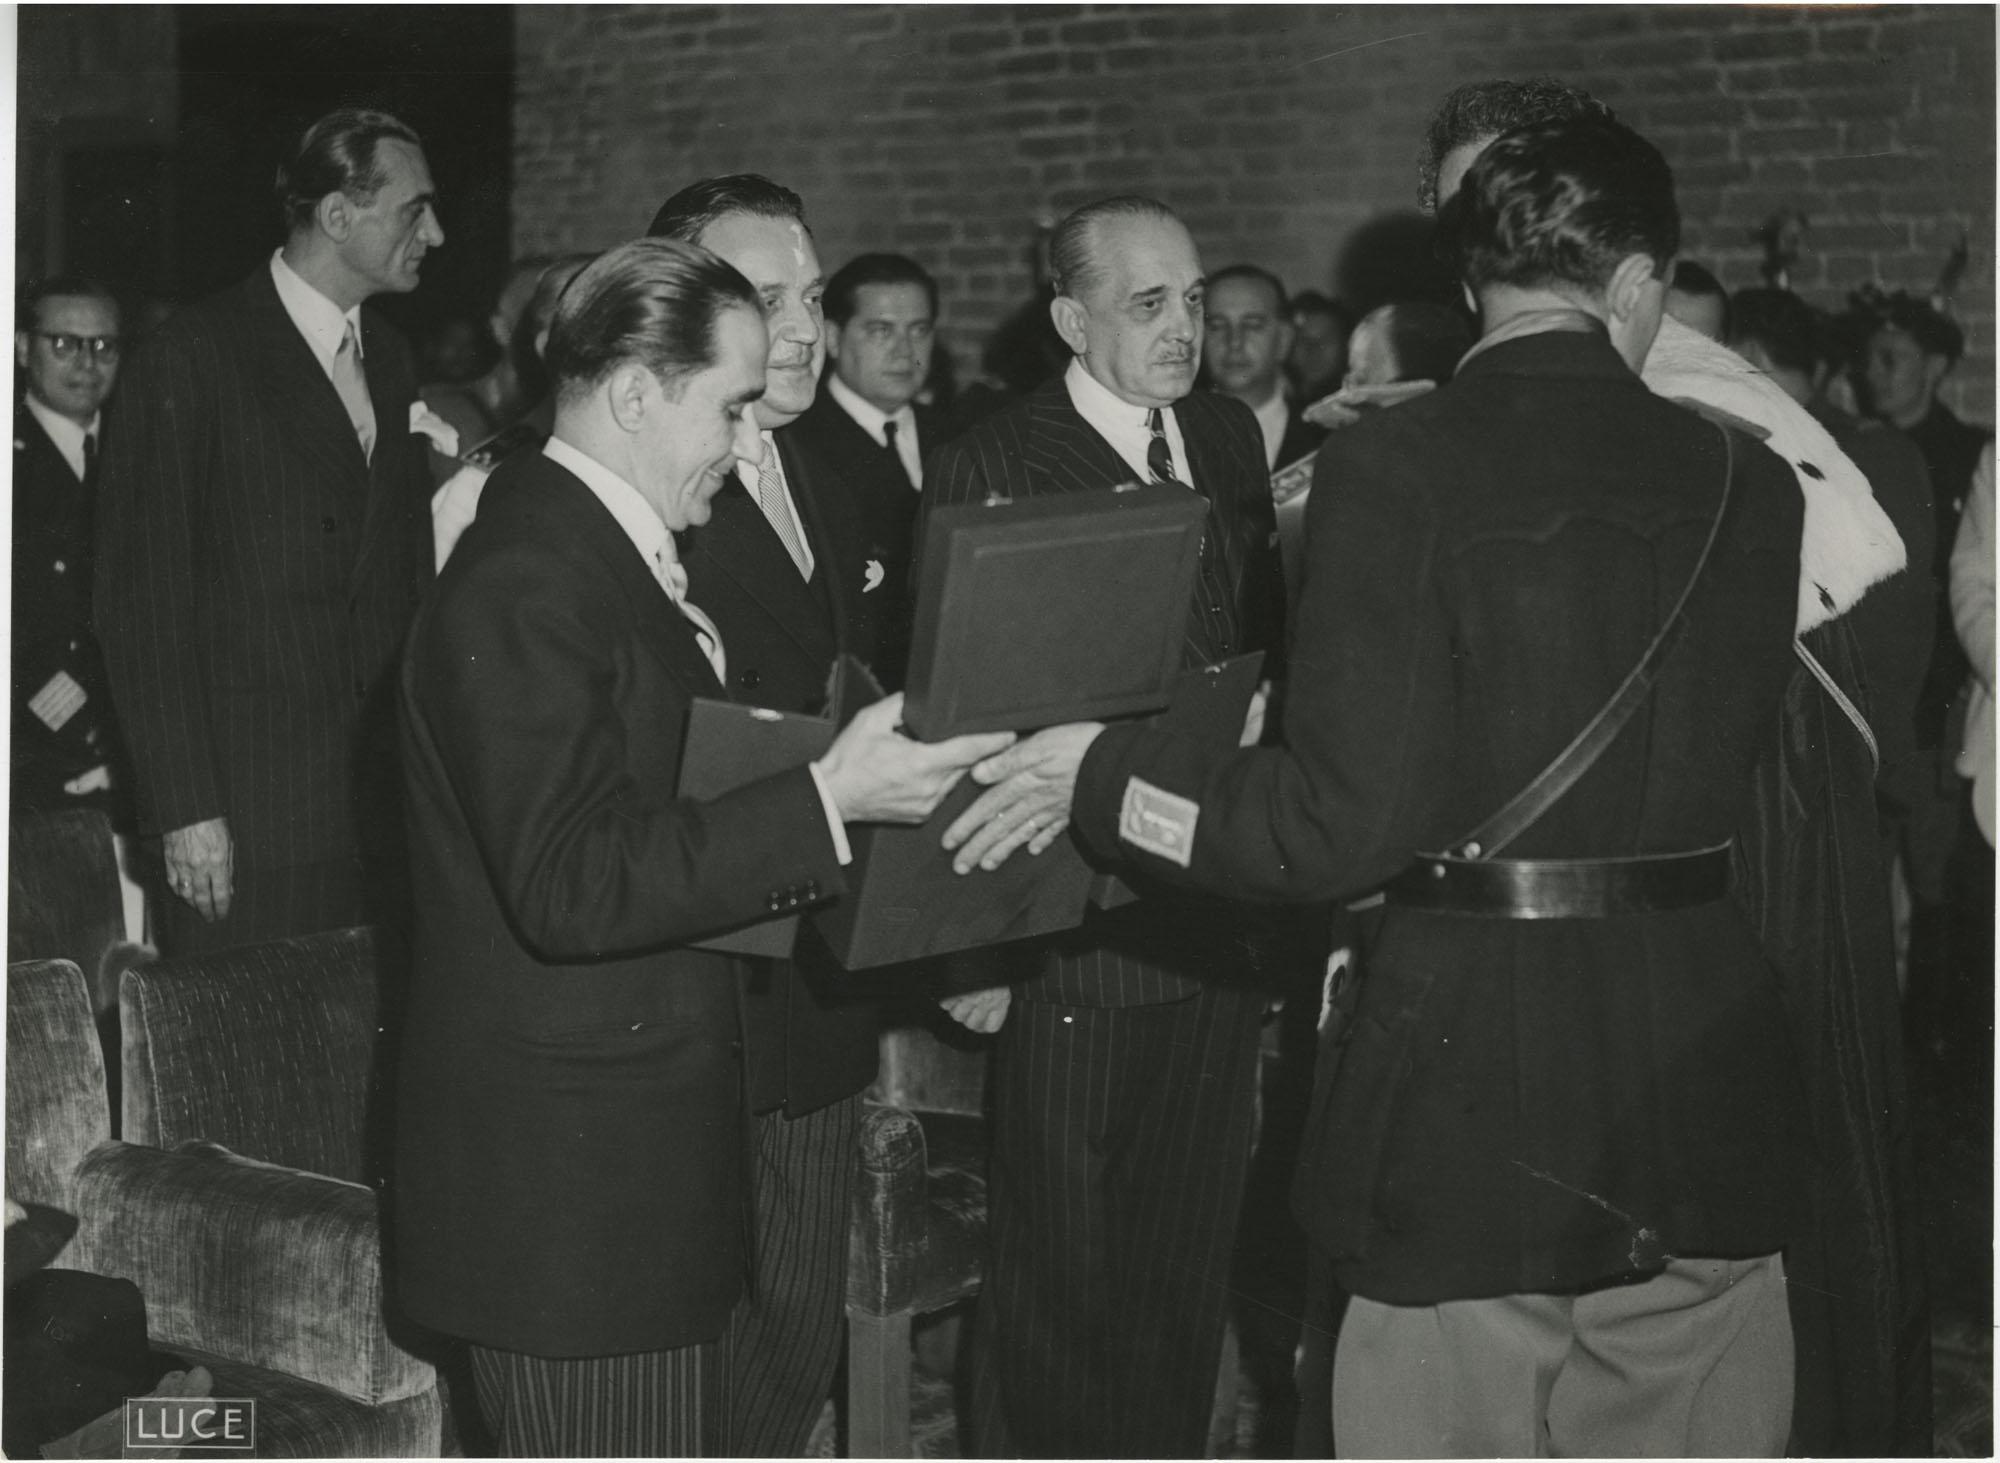 Mihai Antonescu's visit to Benito Mussolini, Photograph 60